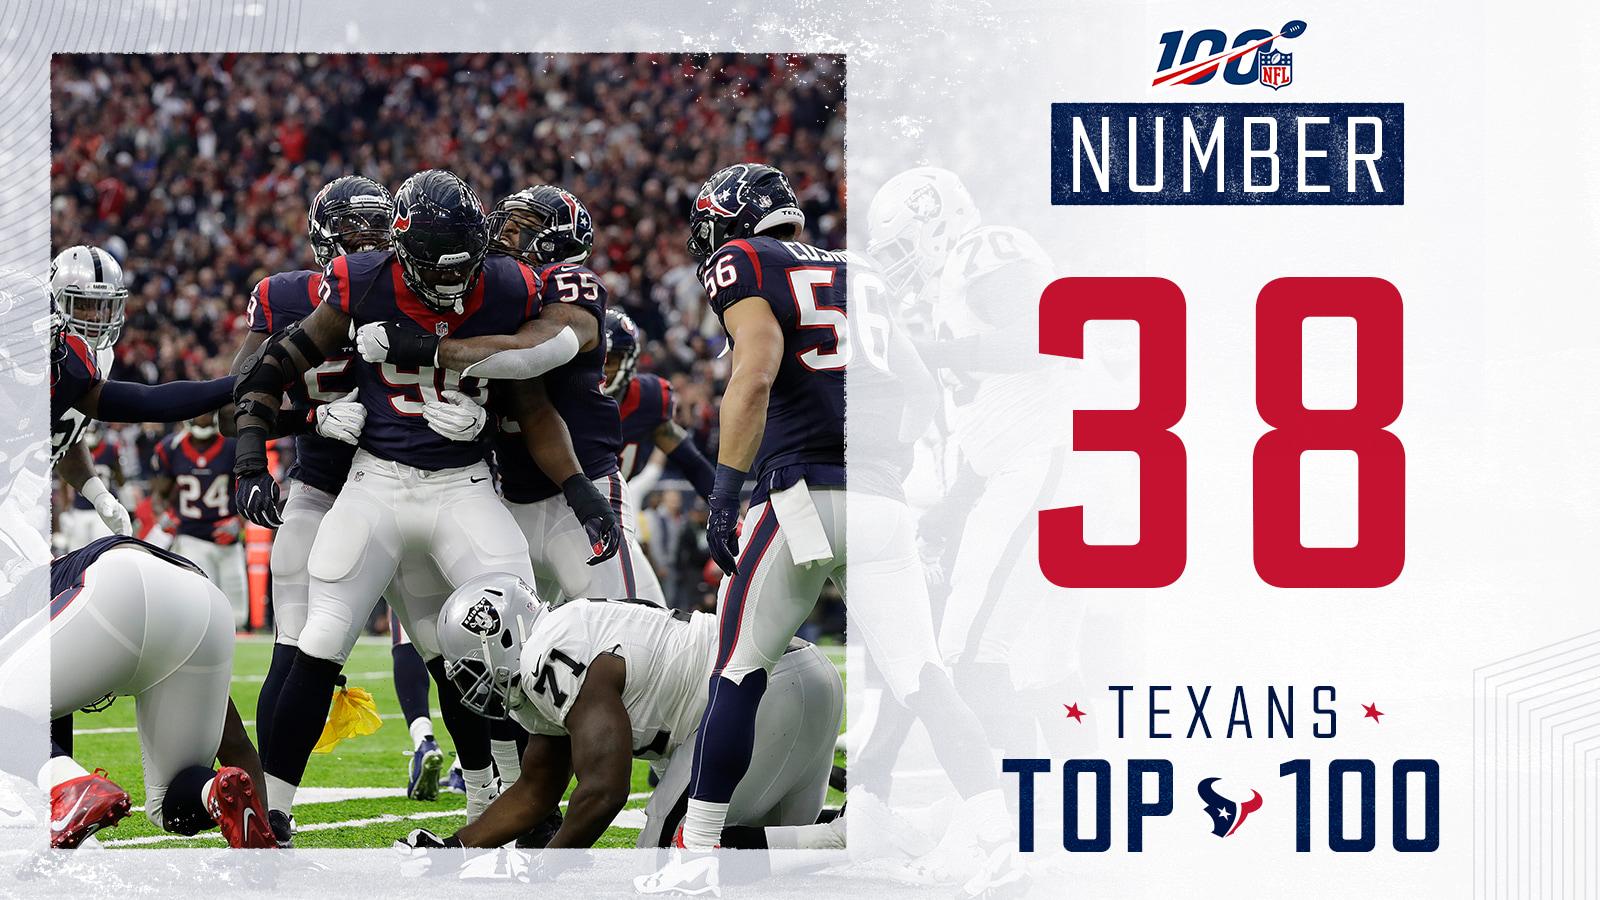 f6d05e41 Texans Top 100 | Houston Texans - HoustonTexans.com